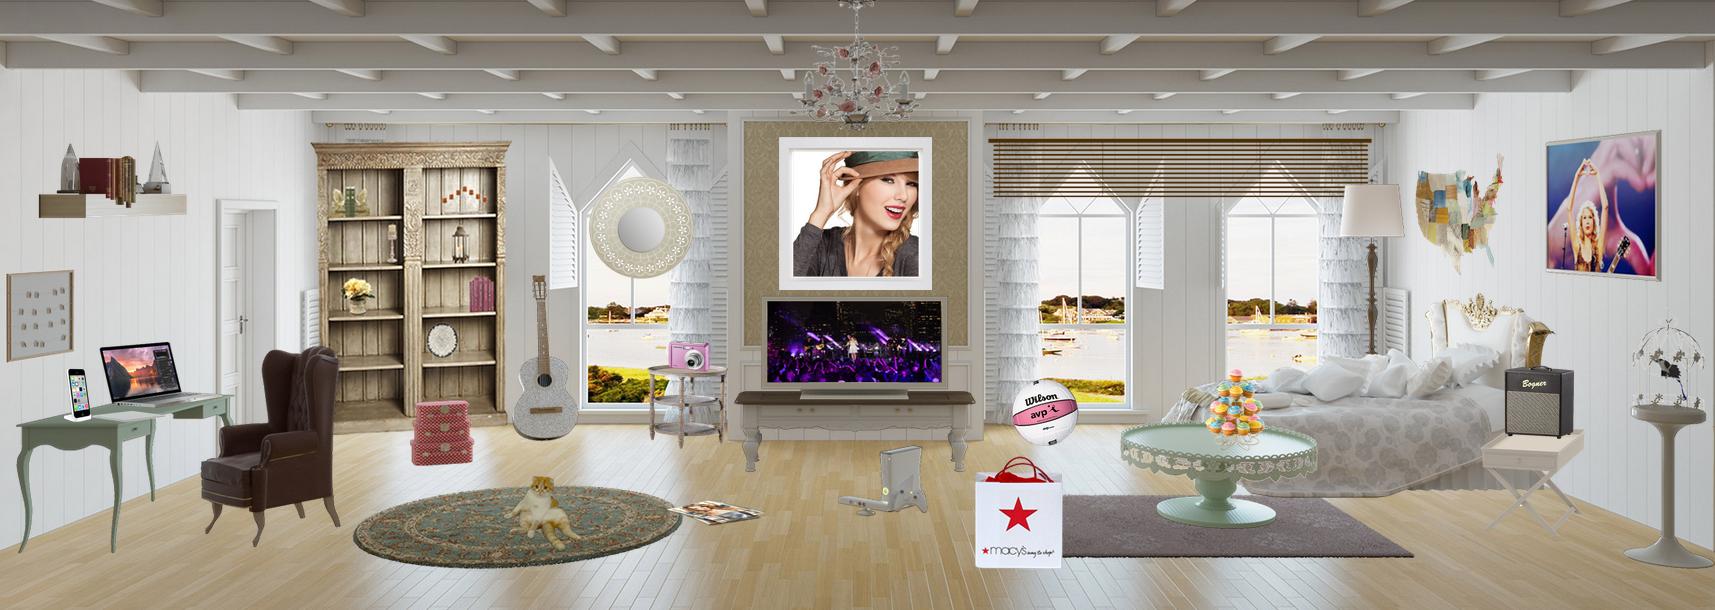 Taylor Swift_online room at myWebRoom.com